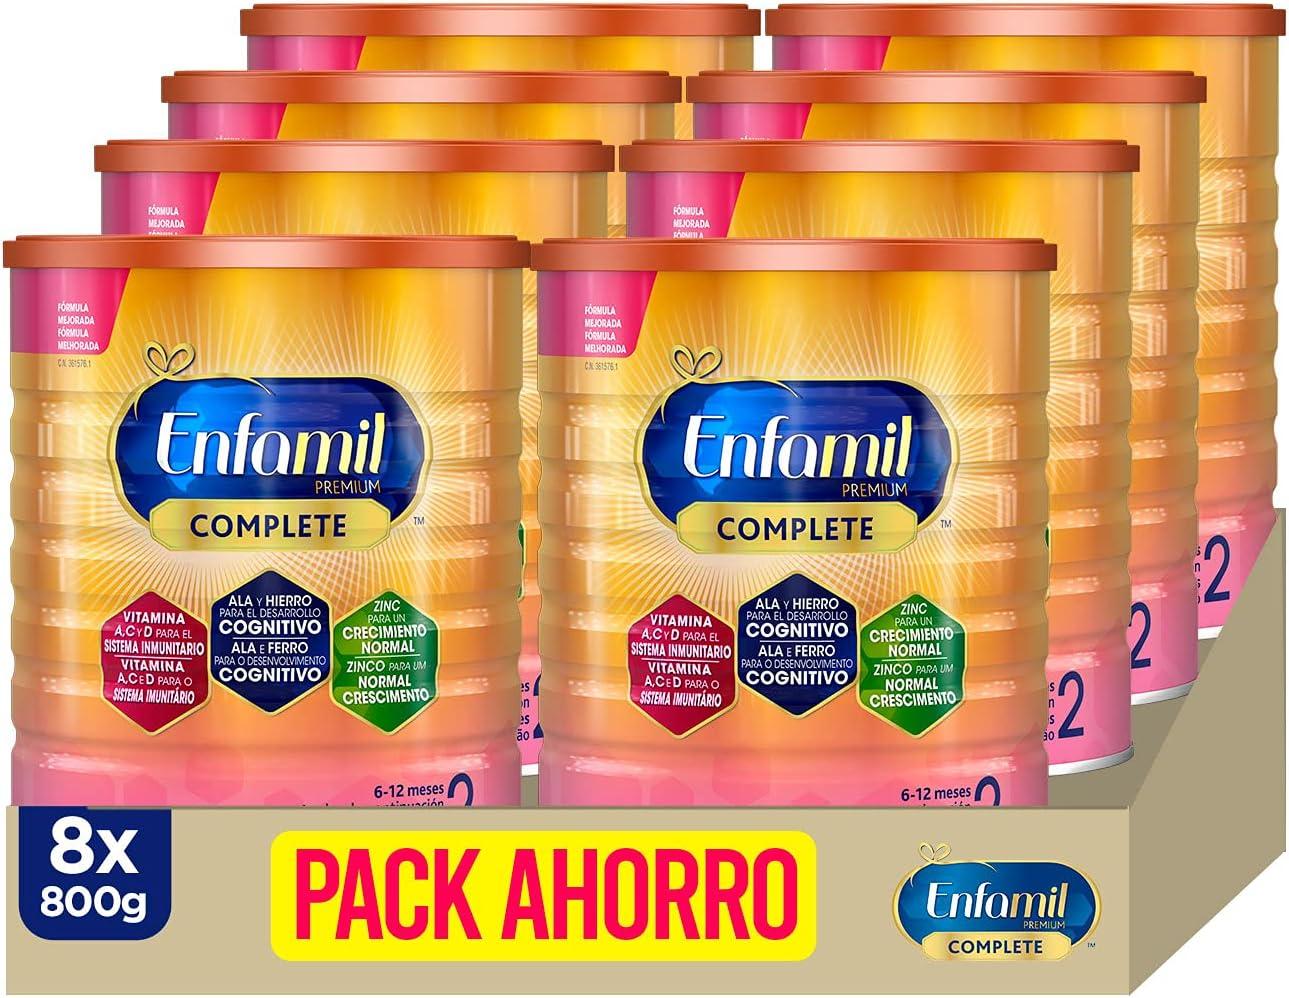 Enfamil Complete 2 - Fórmula leche infantil de continuación para lactantes bebés de 6 a 12 meses - Pack mensual de 8 latas x 800 gr